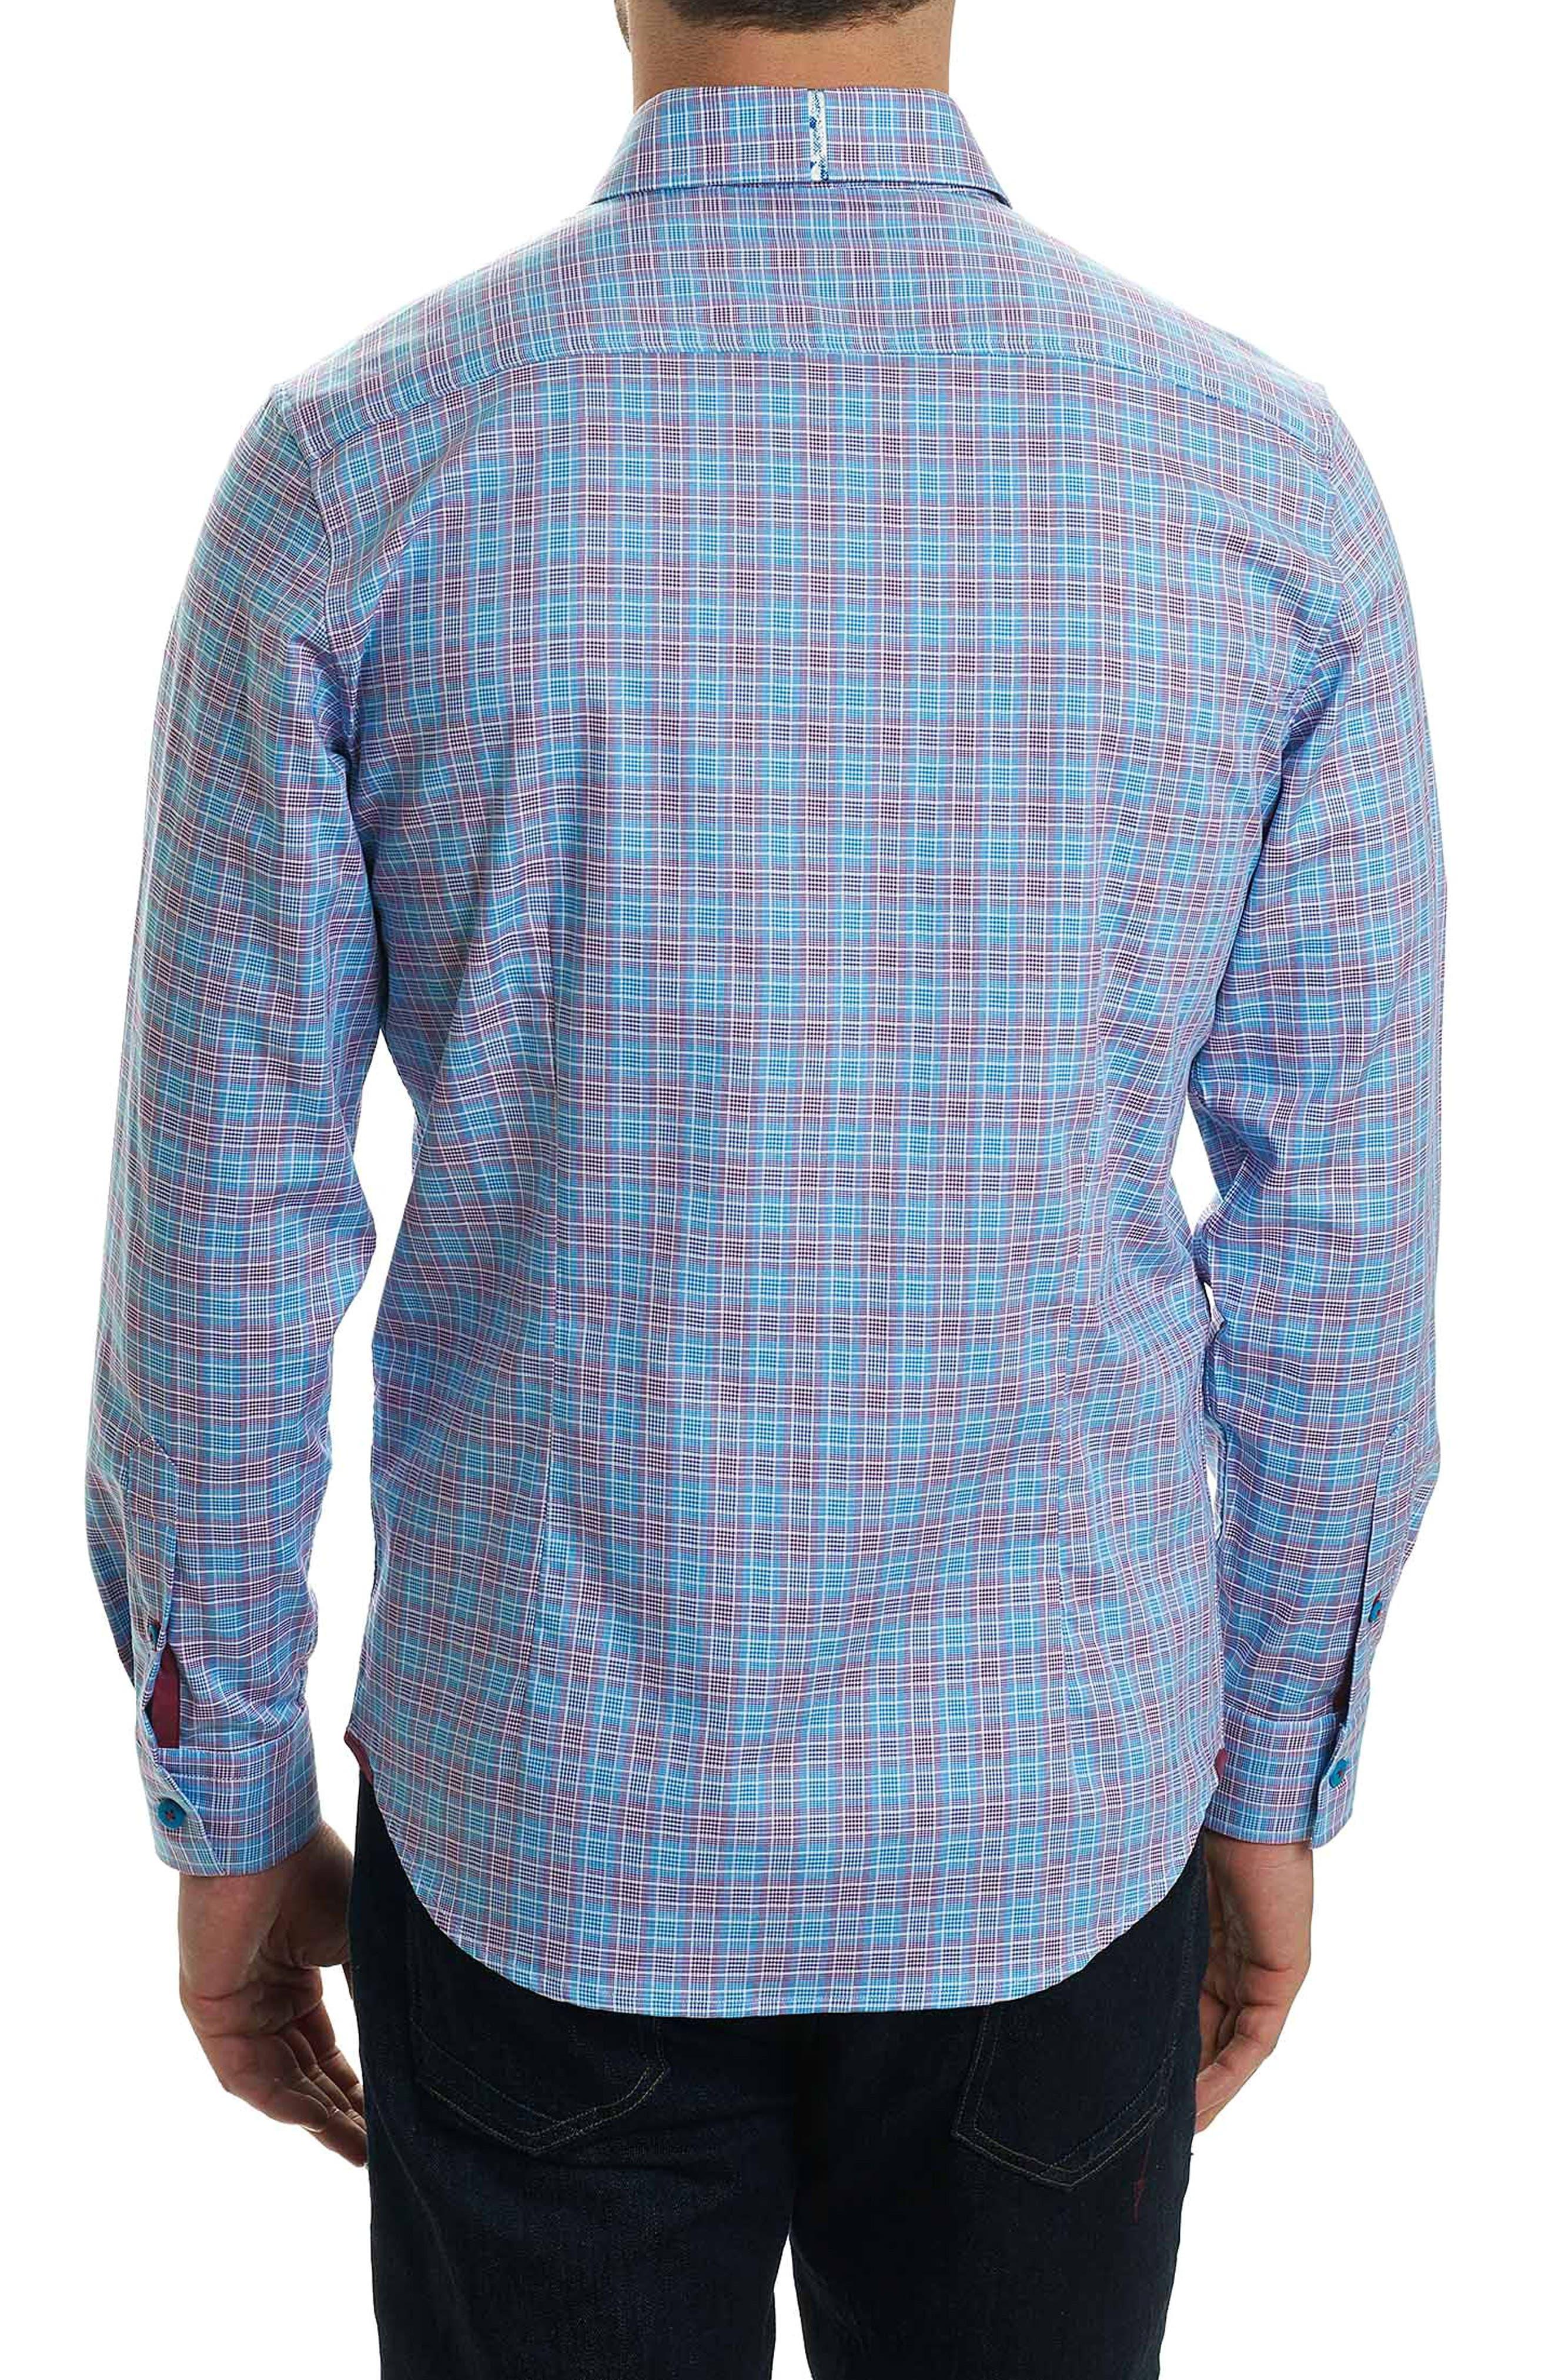 Ryan Regular Fit Sport Shirt,                             Alternate thumbnail 2, color,                             510